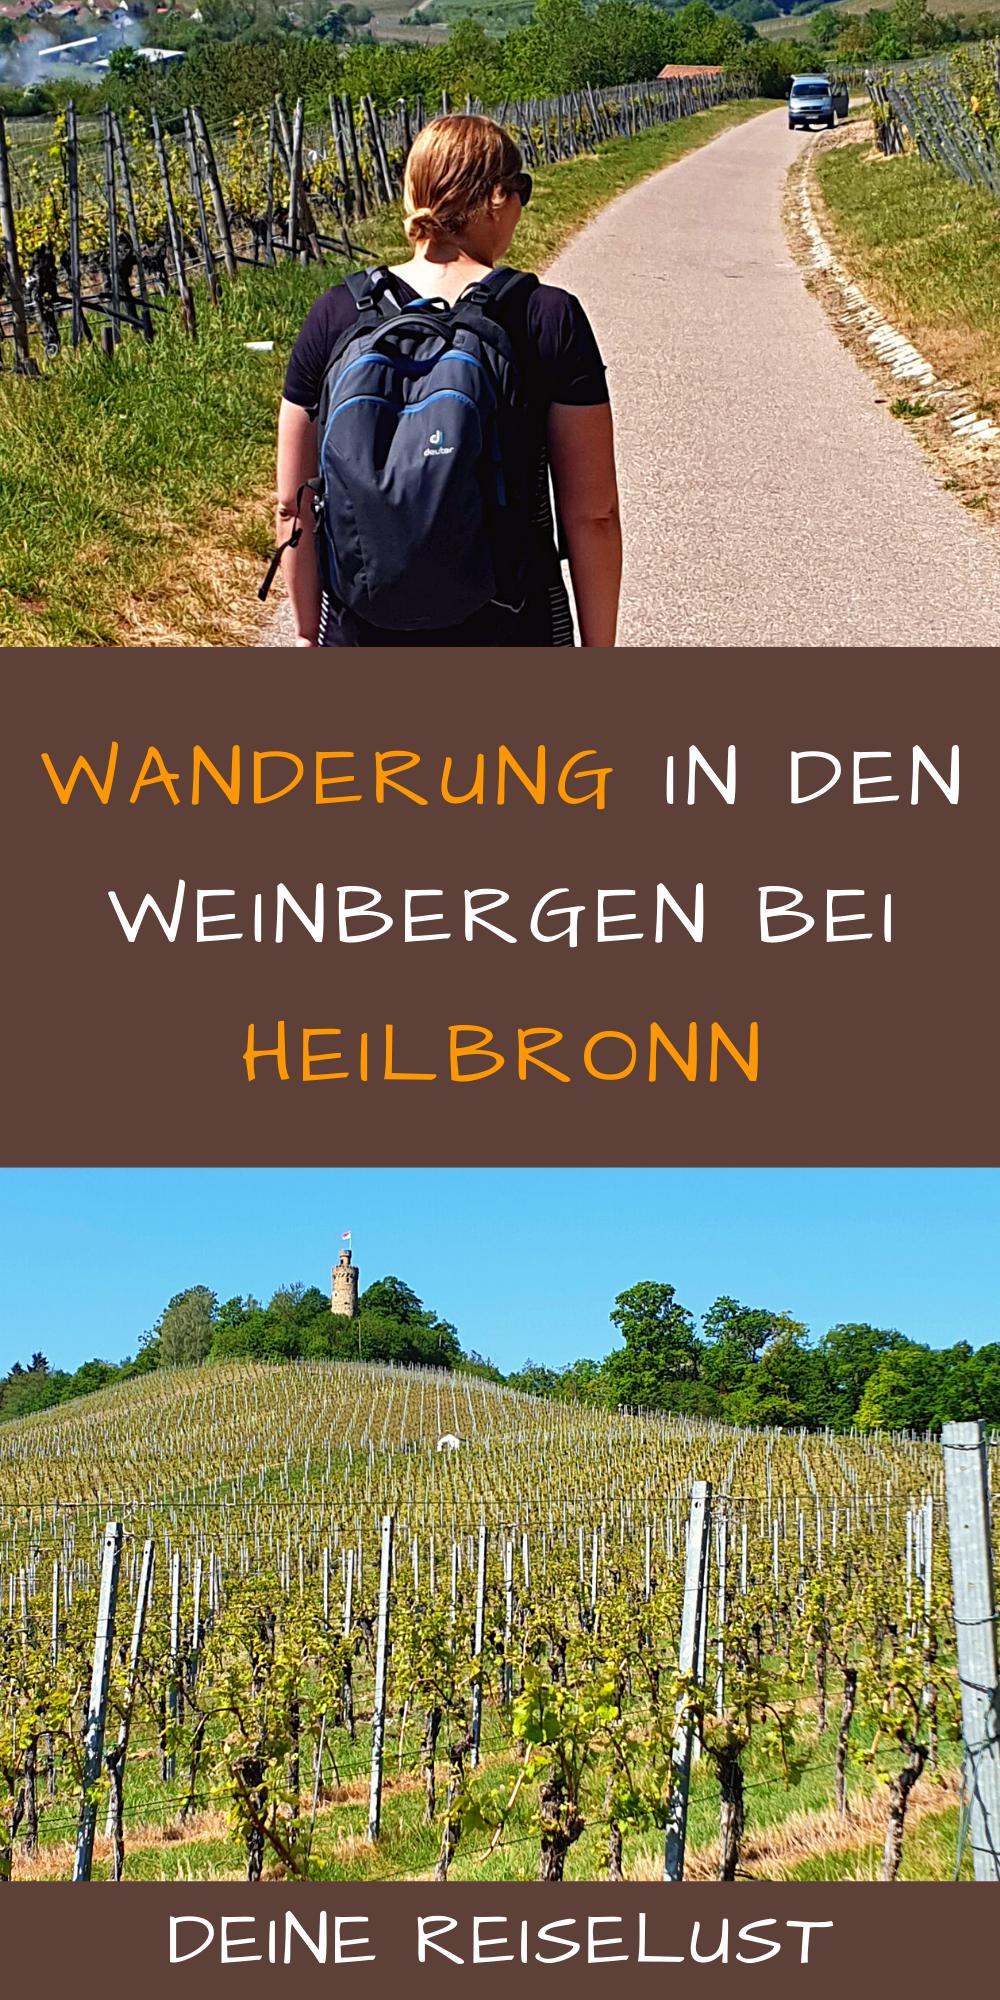 Wanderung In Den Weinbergen Bei Heilbronn In 2020 Wanderung Reisen Heilbronn